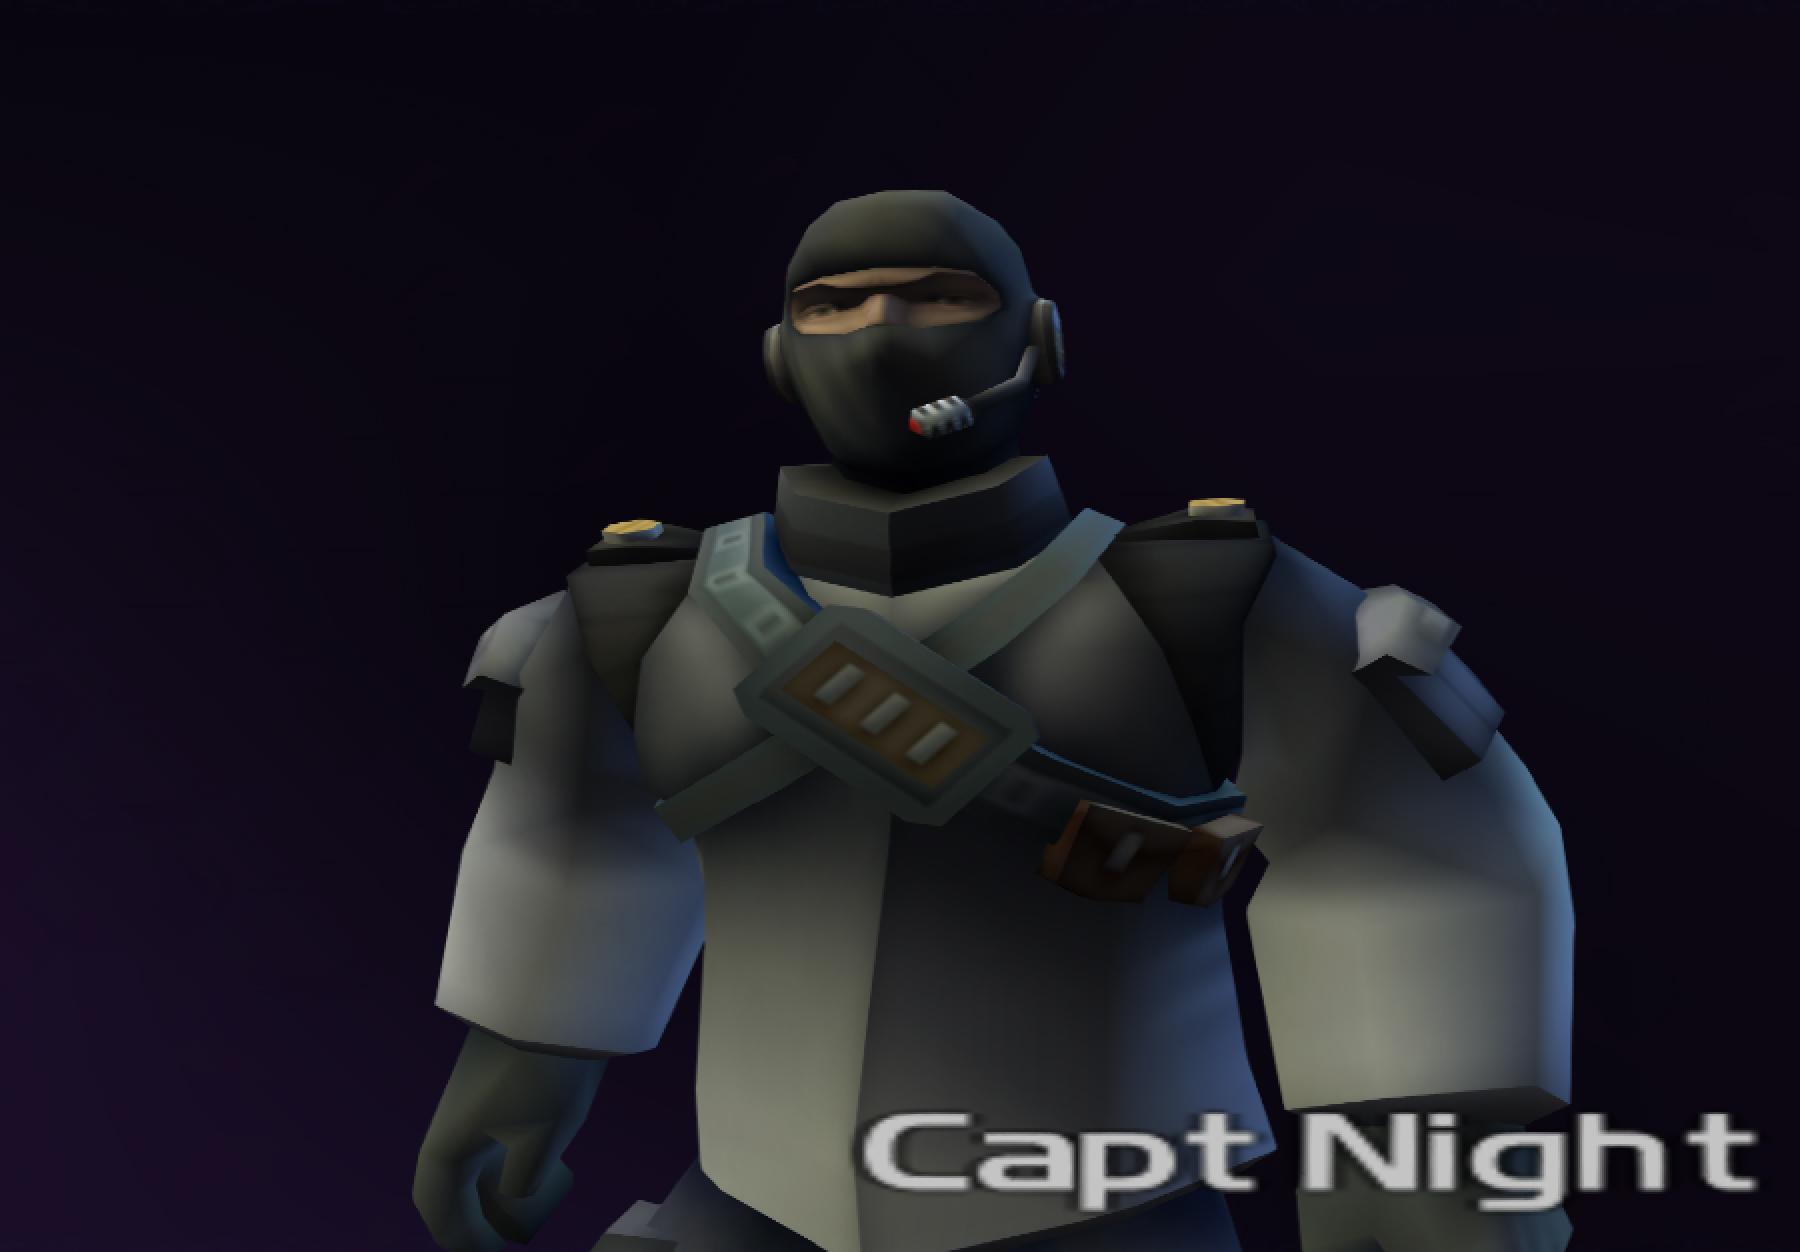 Captain Night